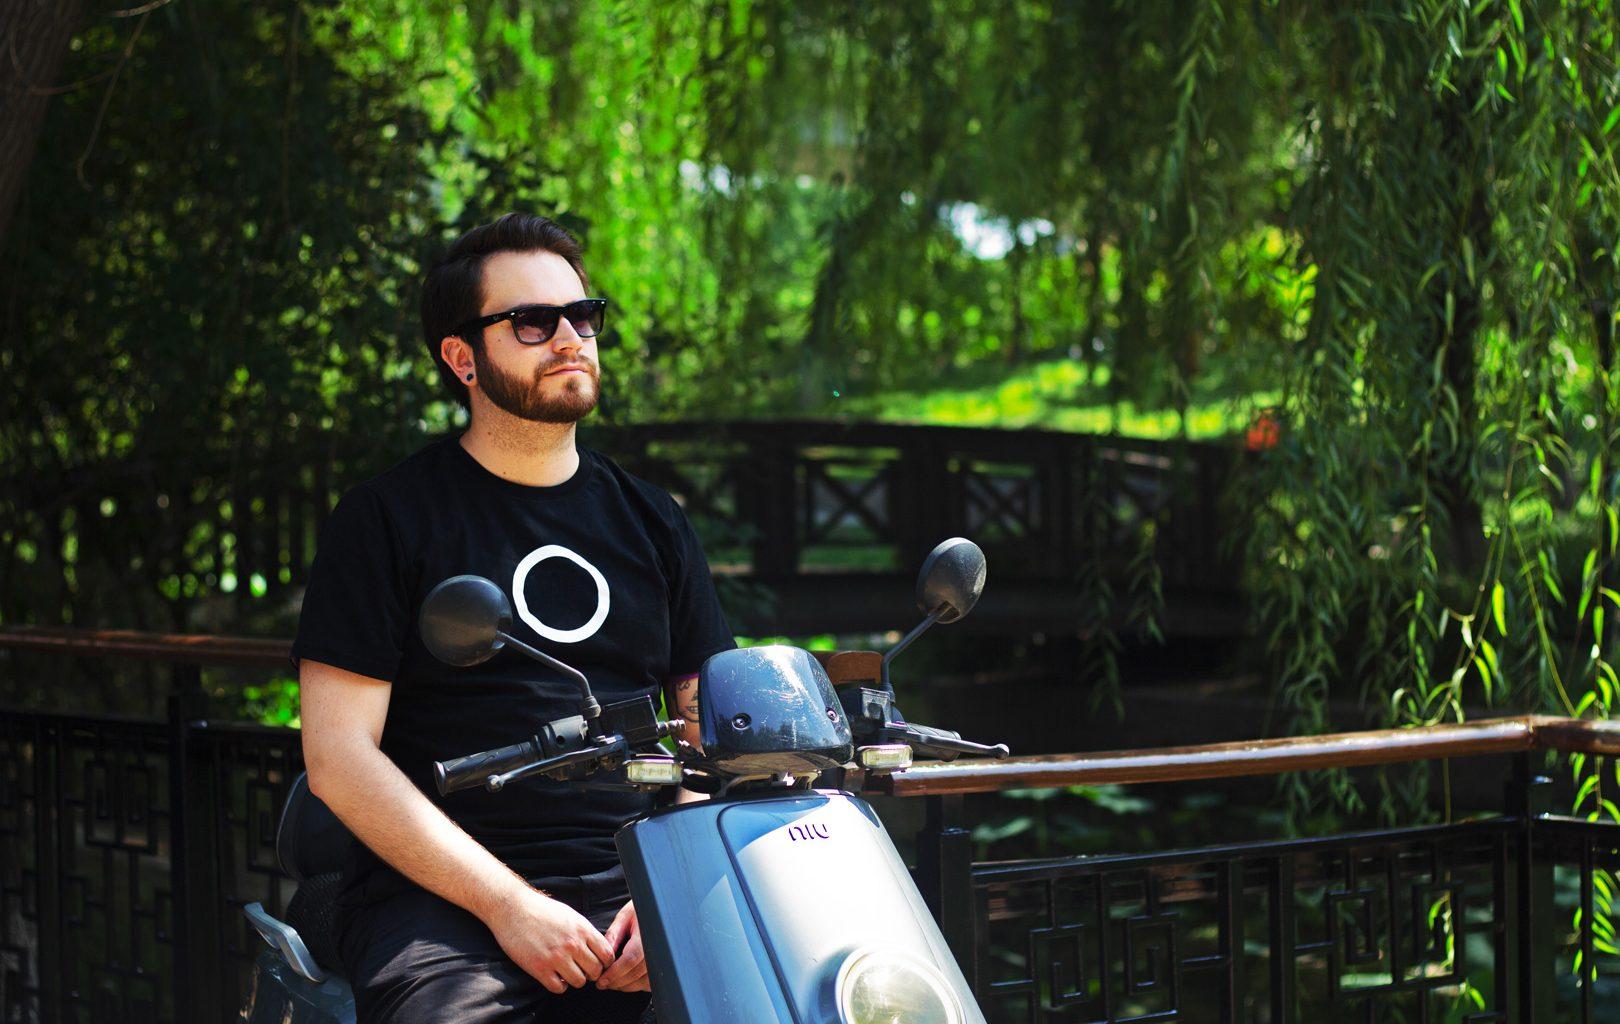 Man on a NIU electric scooter next to bridge